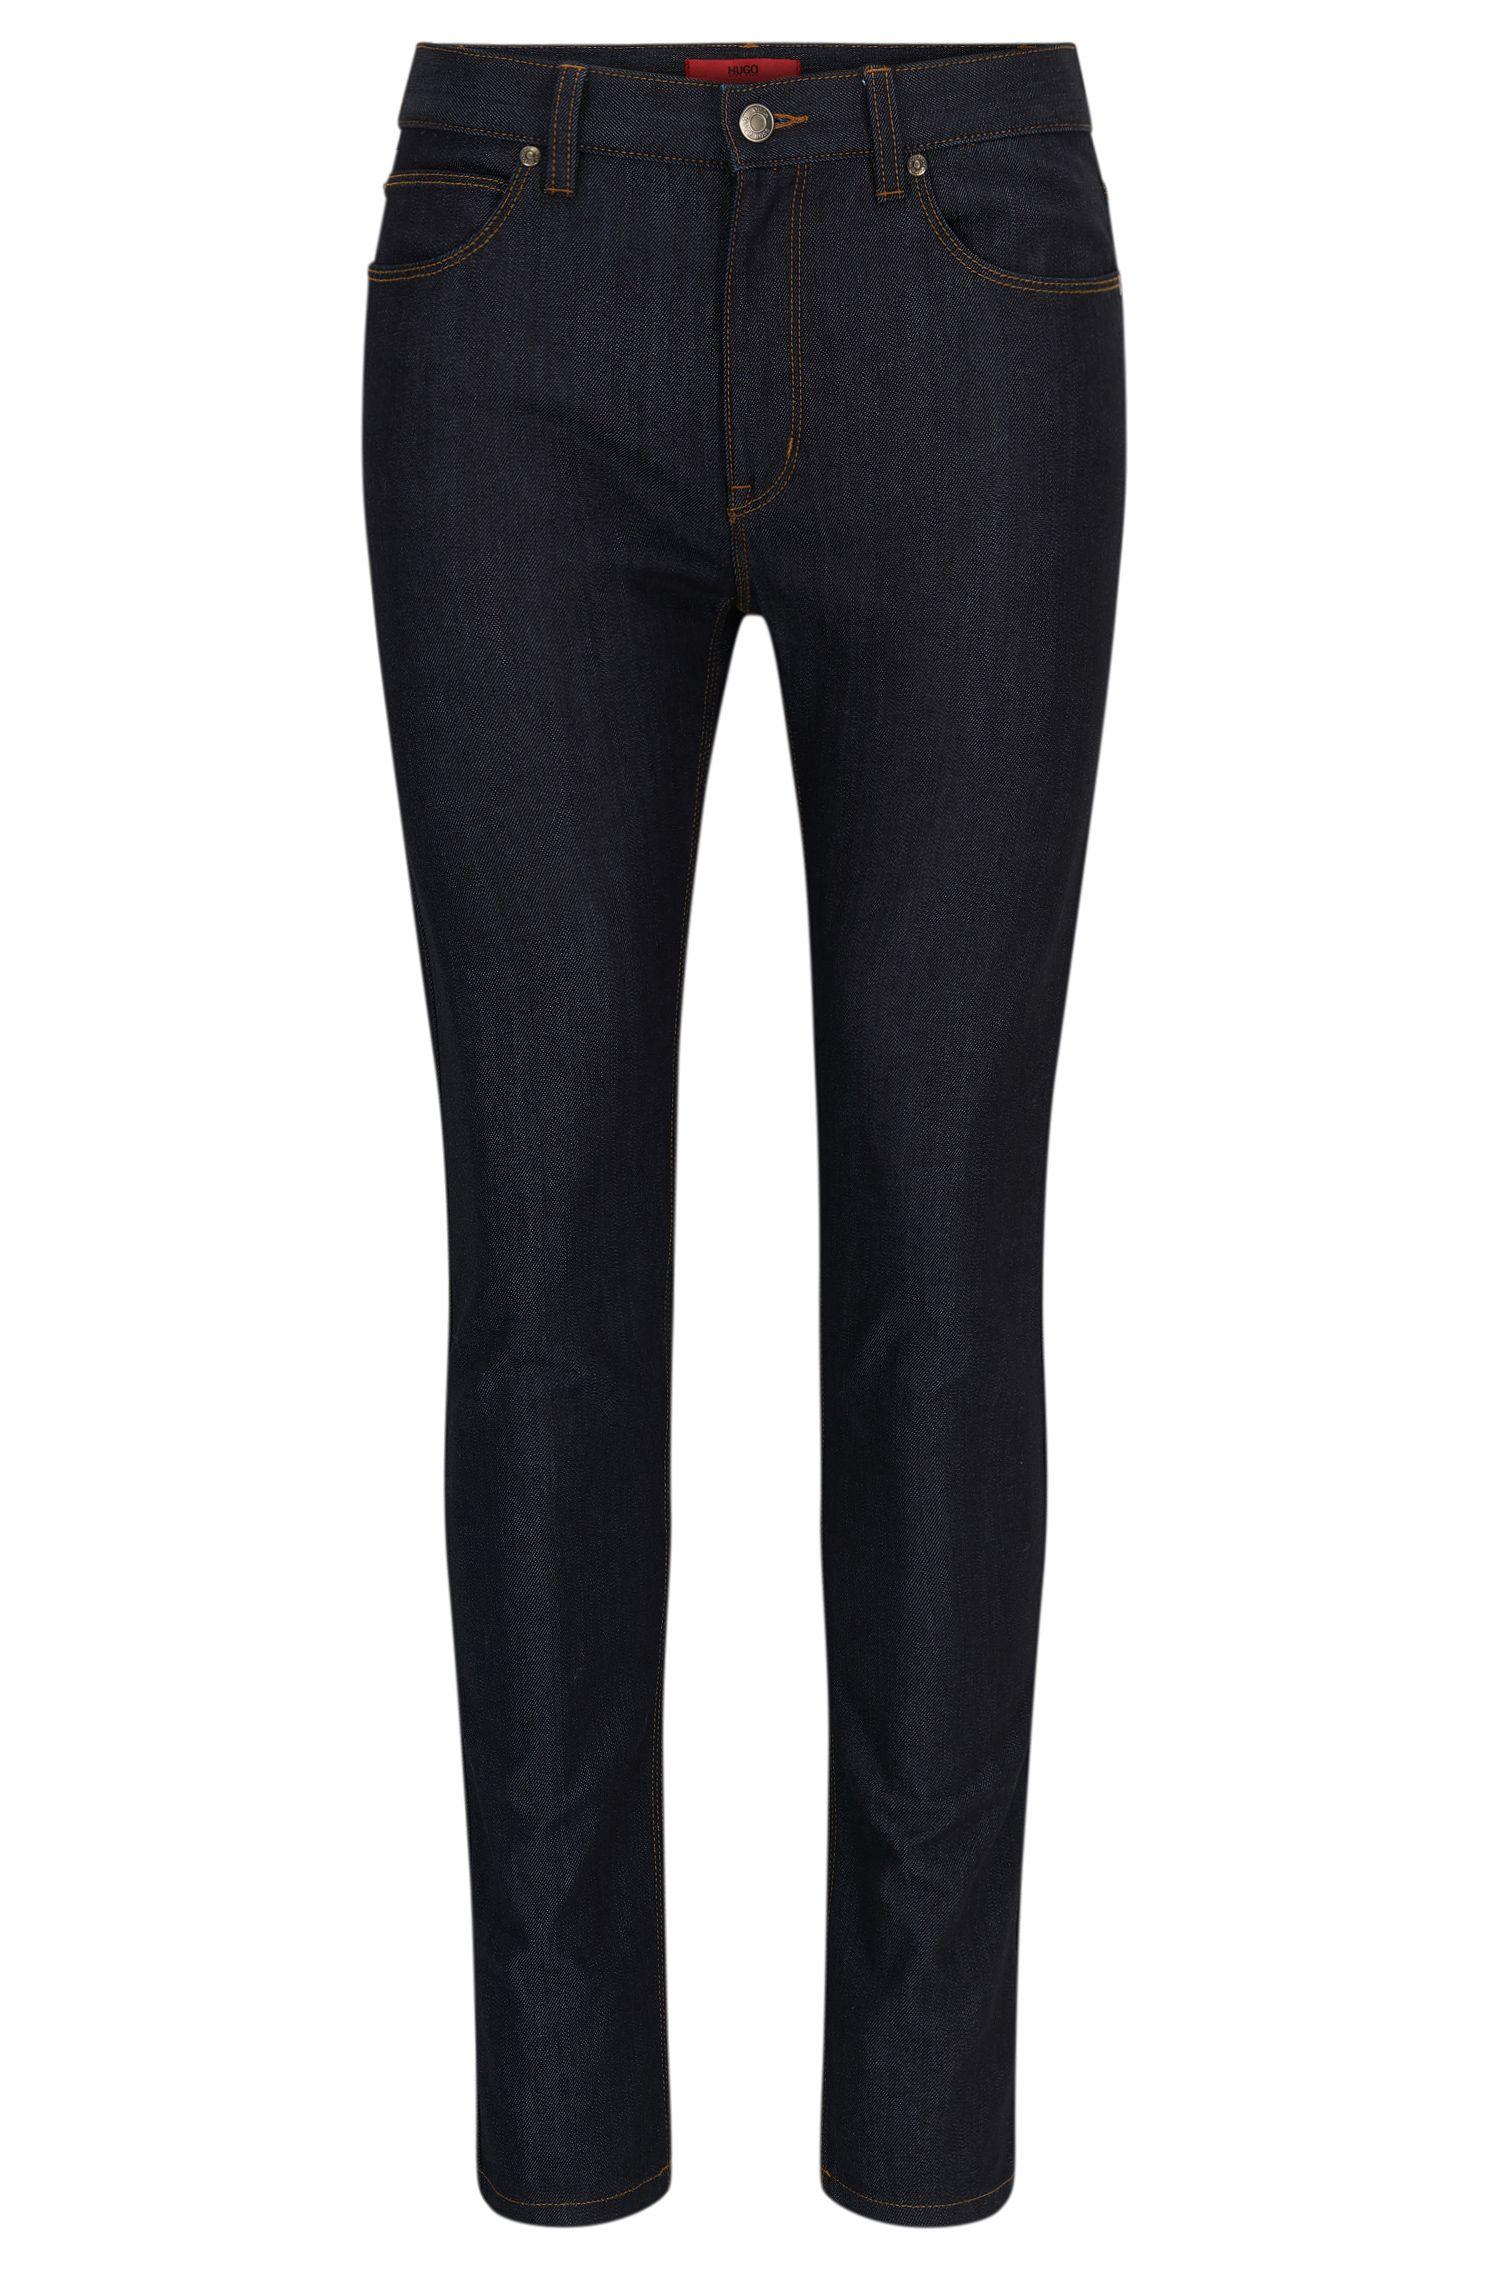 Skinny-fit jeans van uiterst duurzame stretchdenim